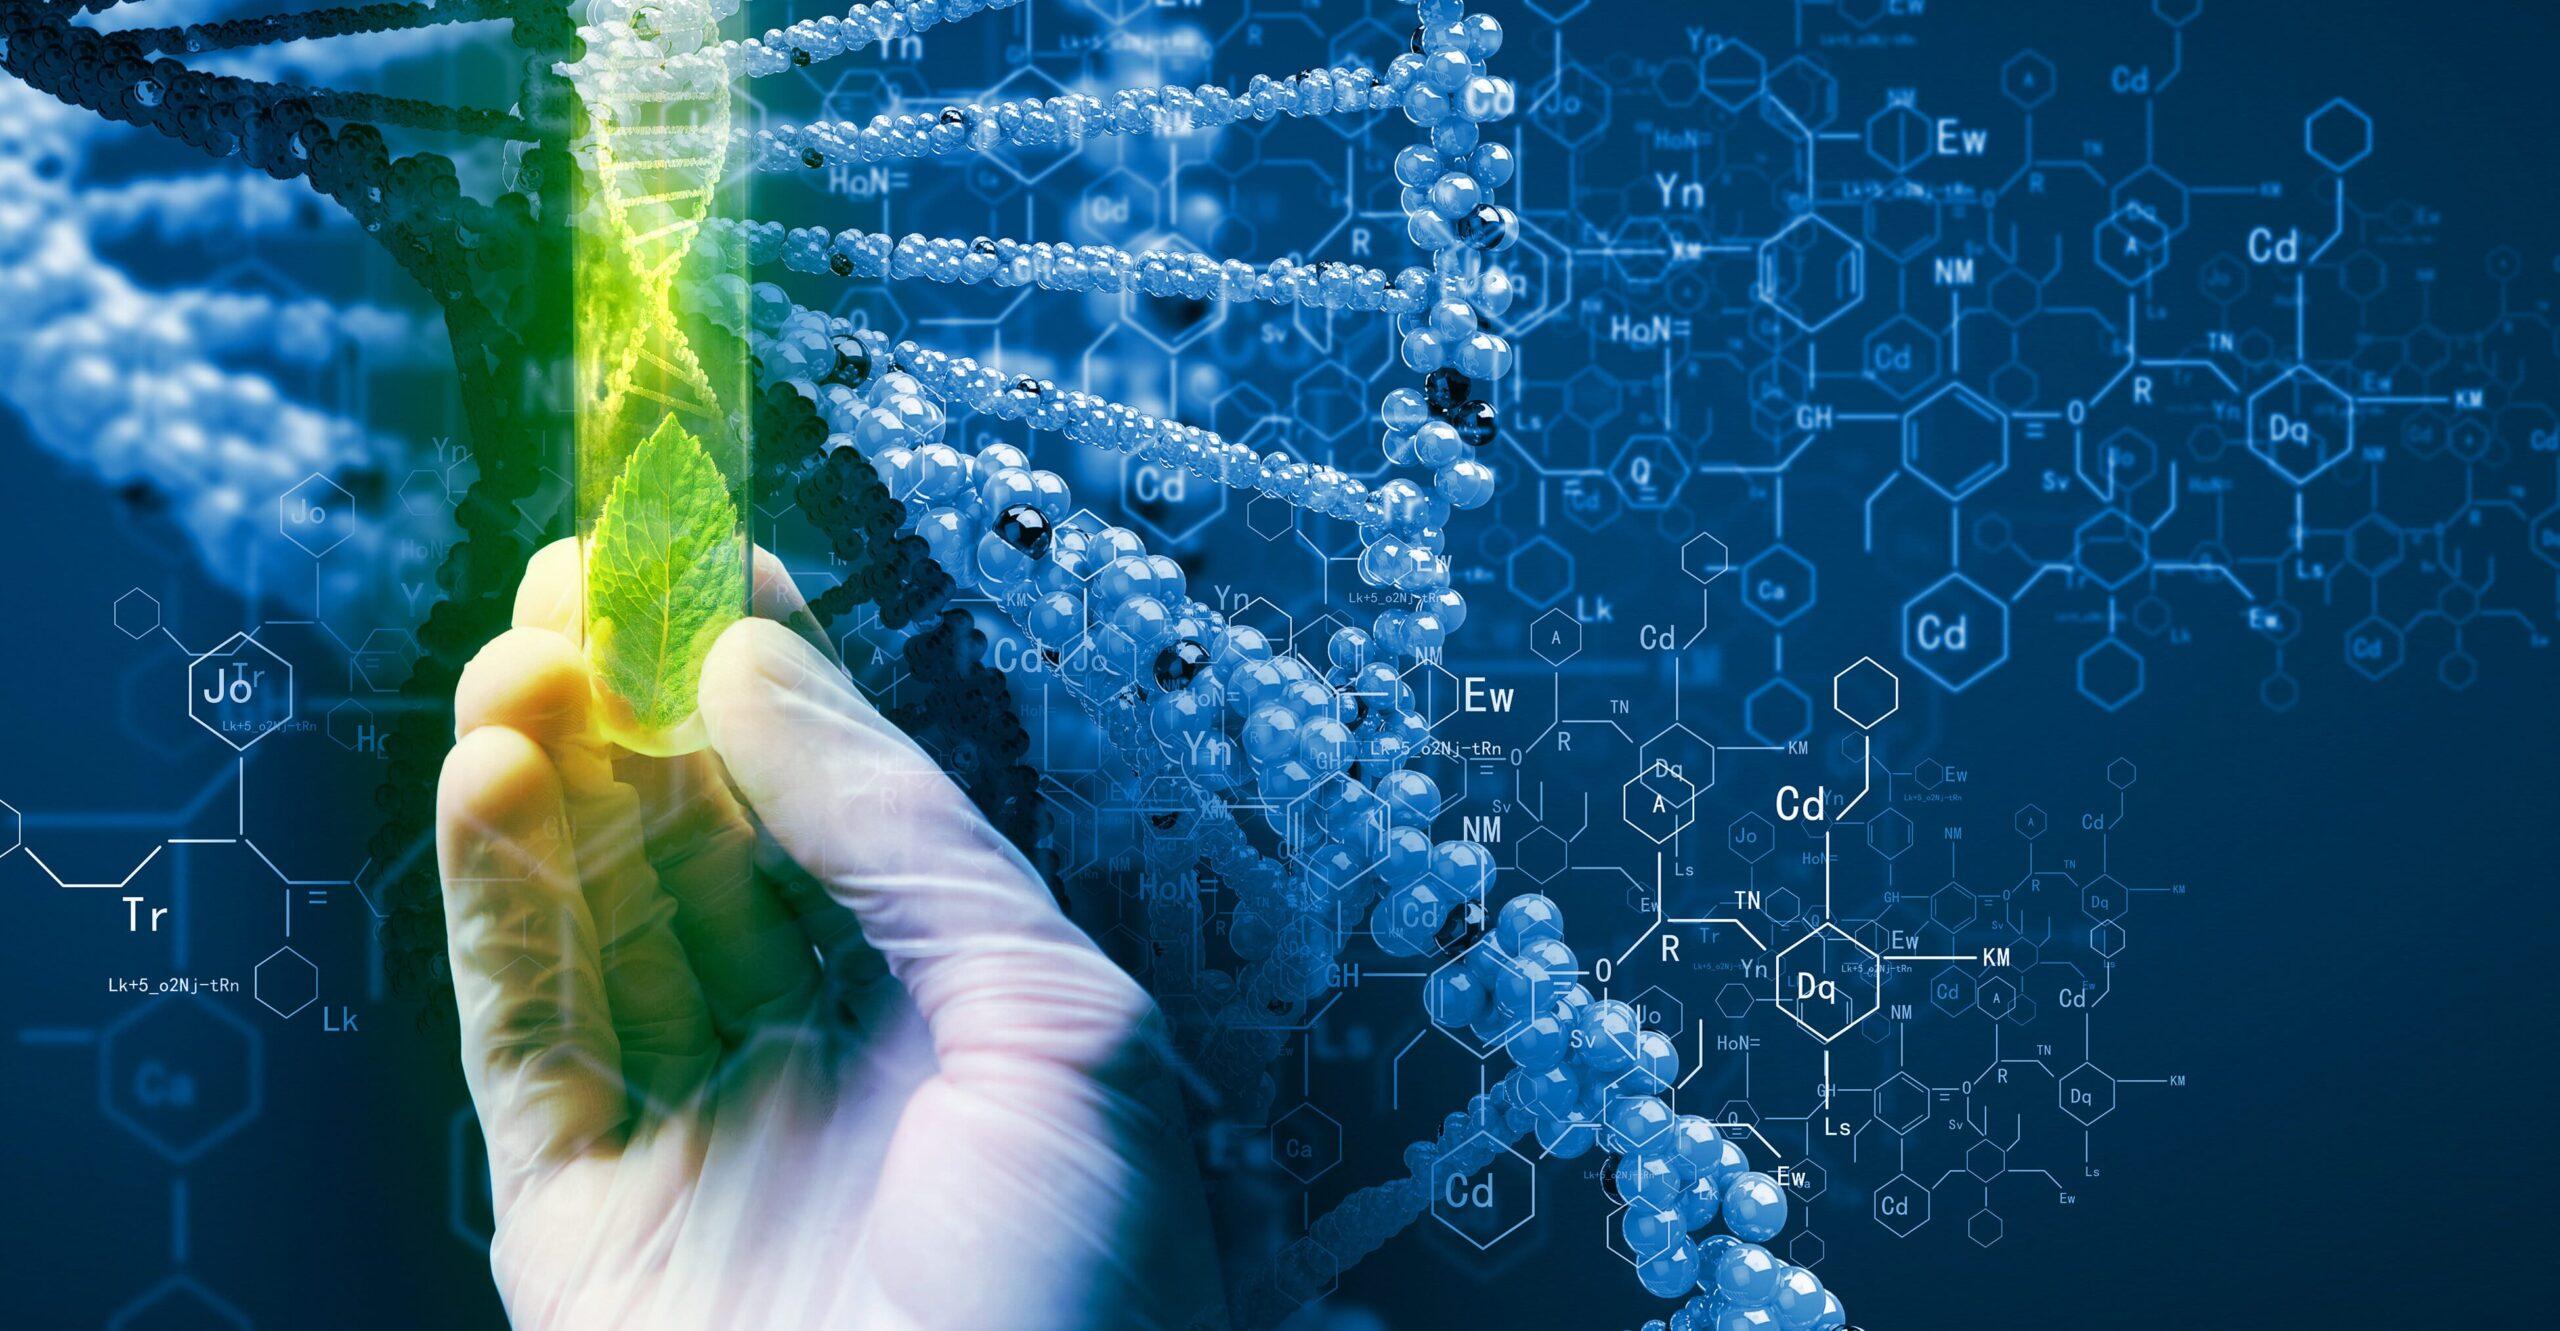 BioPharma Company: Sunshine Biopharma (Stock Symbol: SBFM) in High Value Sectors of Cancer Treatments, Science-Based Supplements and a Key Anti-Coronavirus Drug